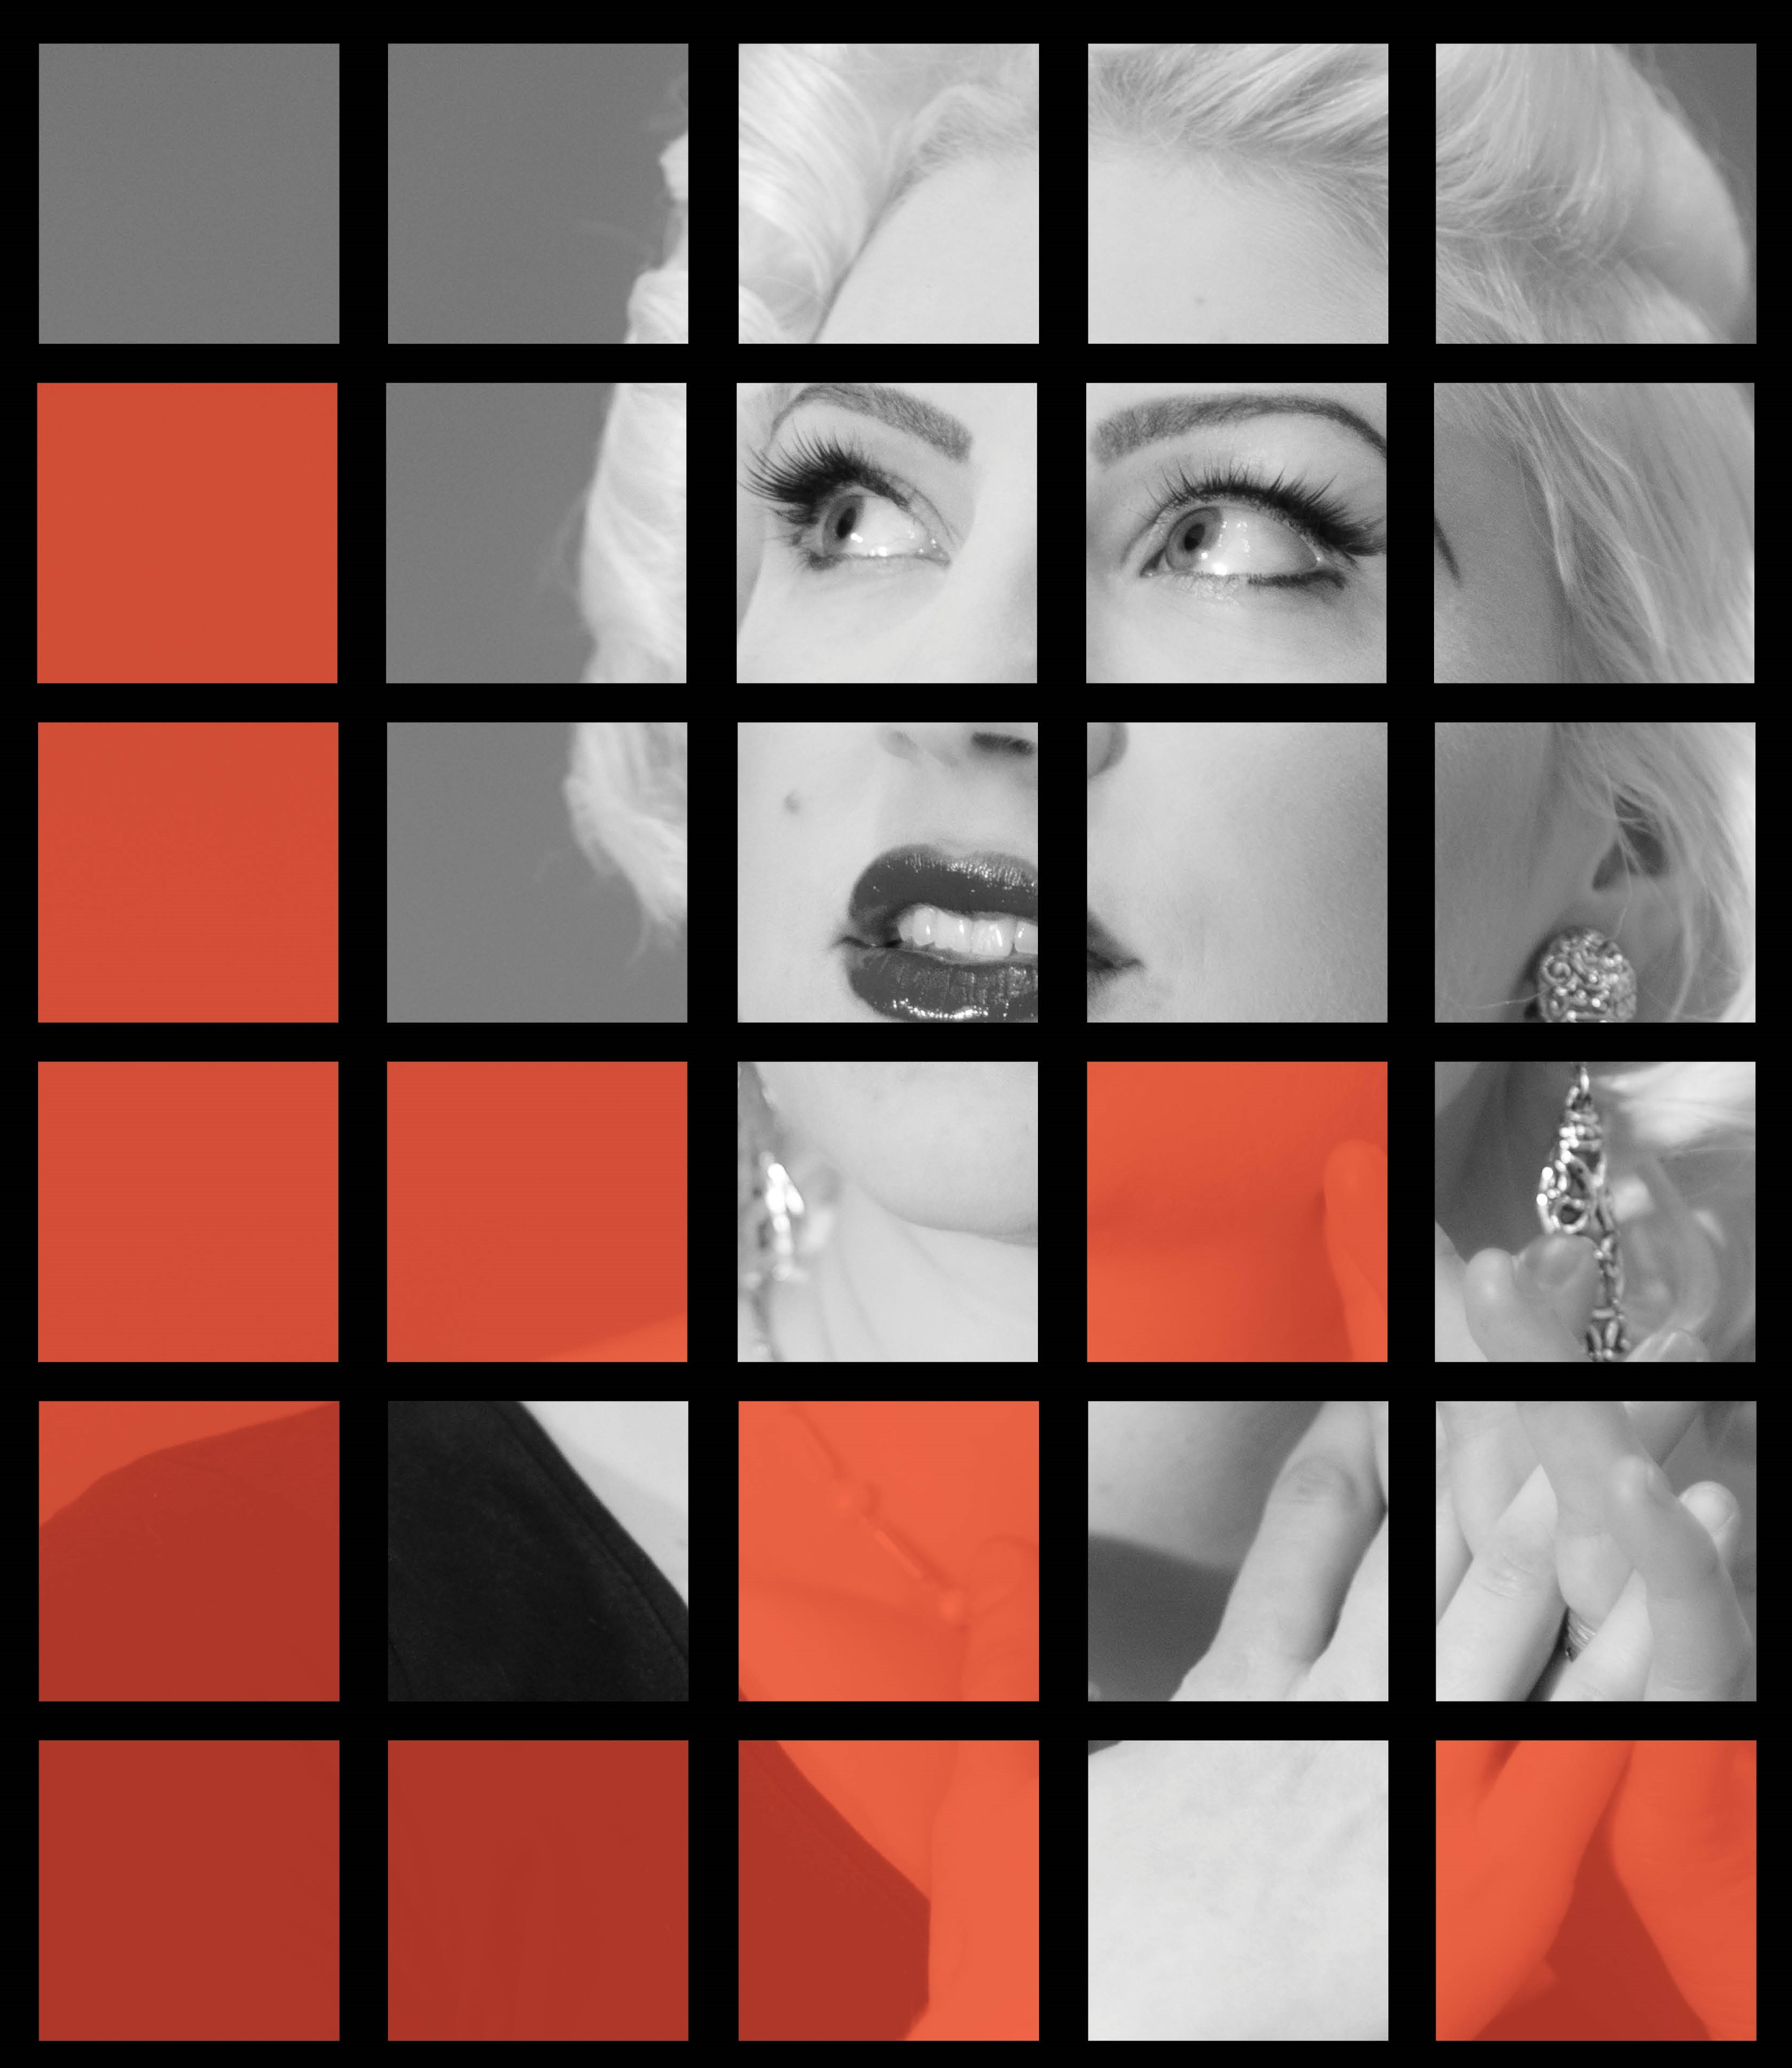 Affischbild_Marilyn